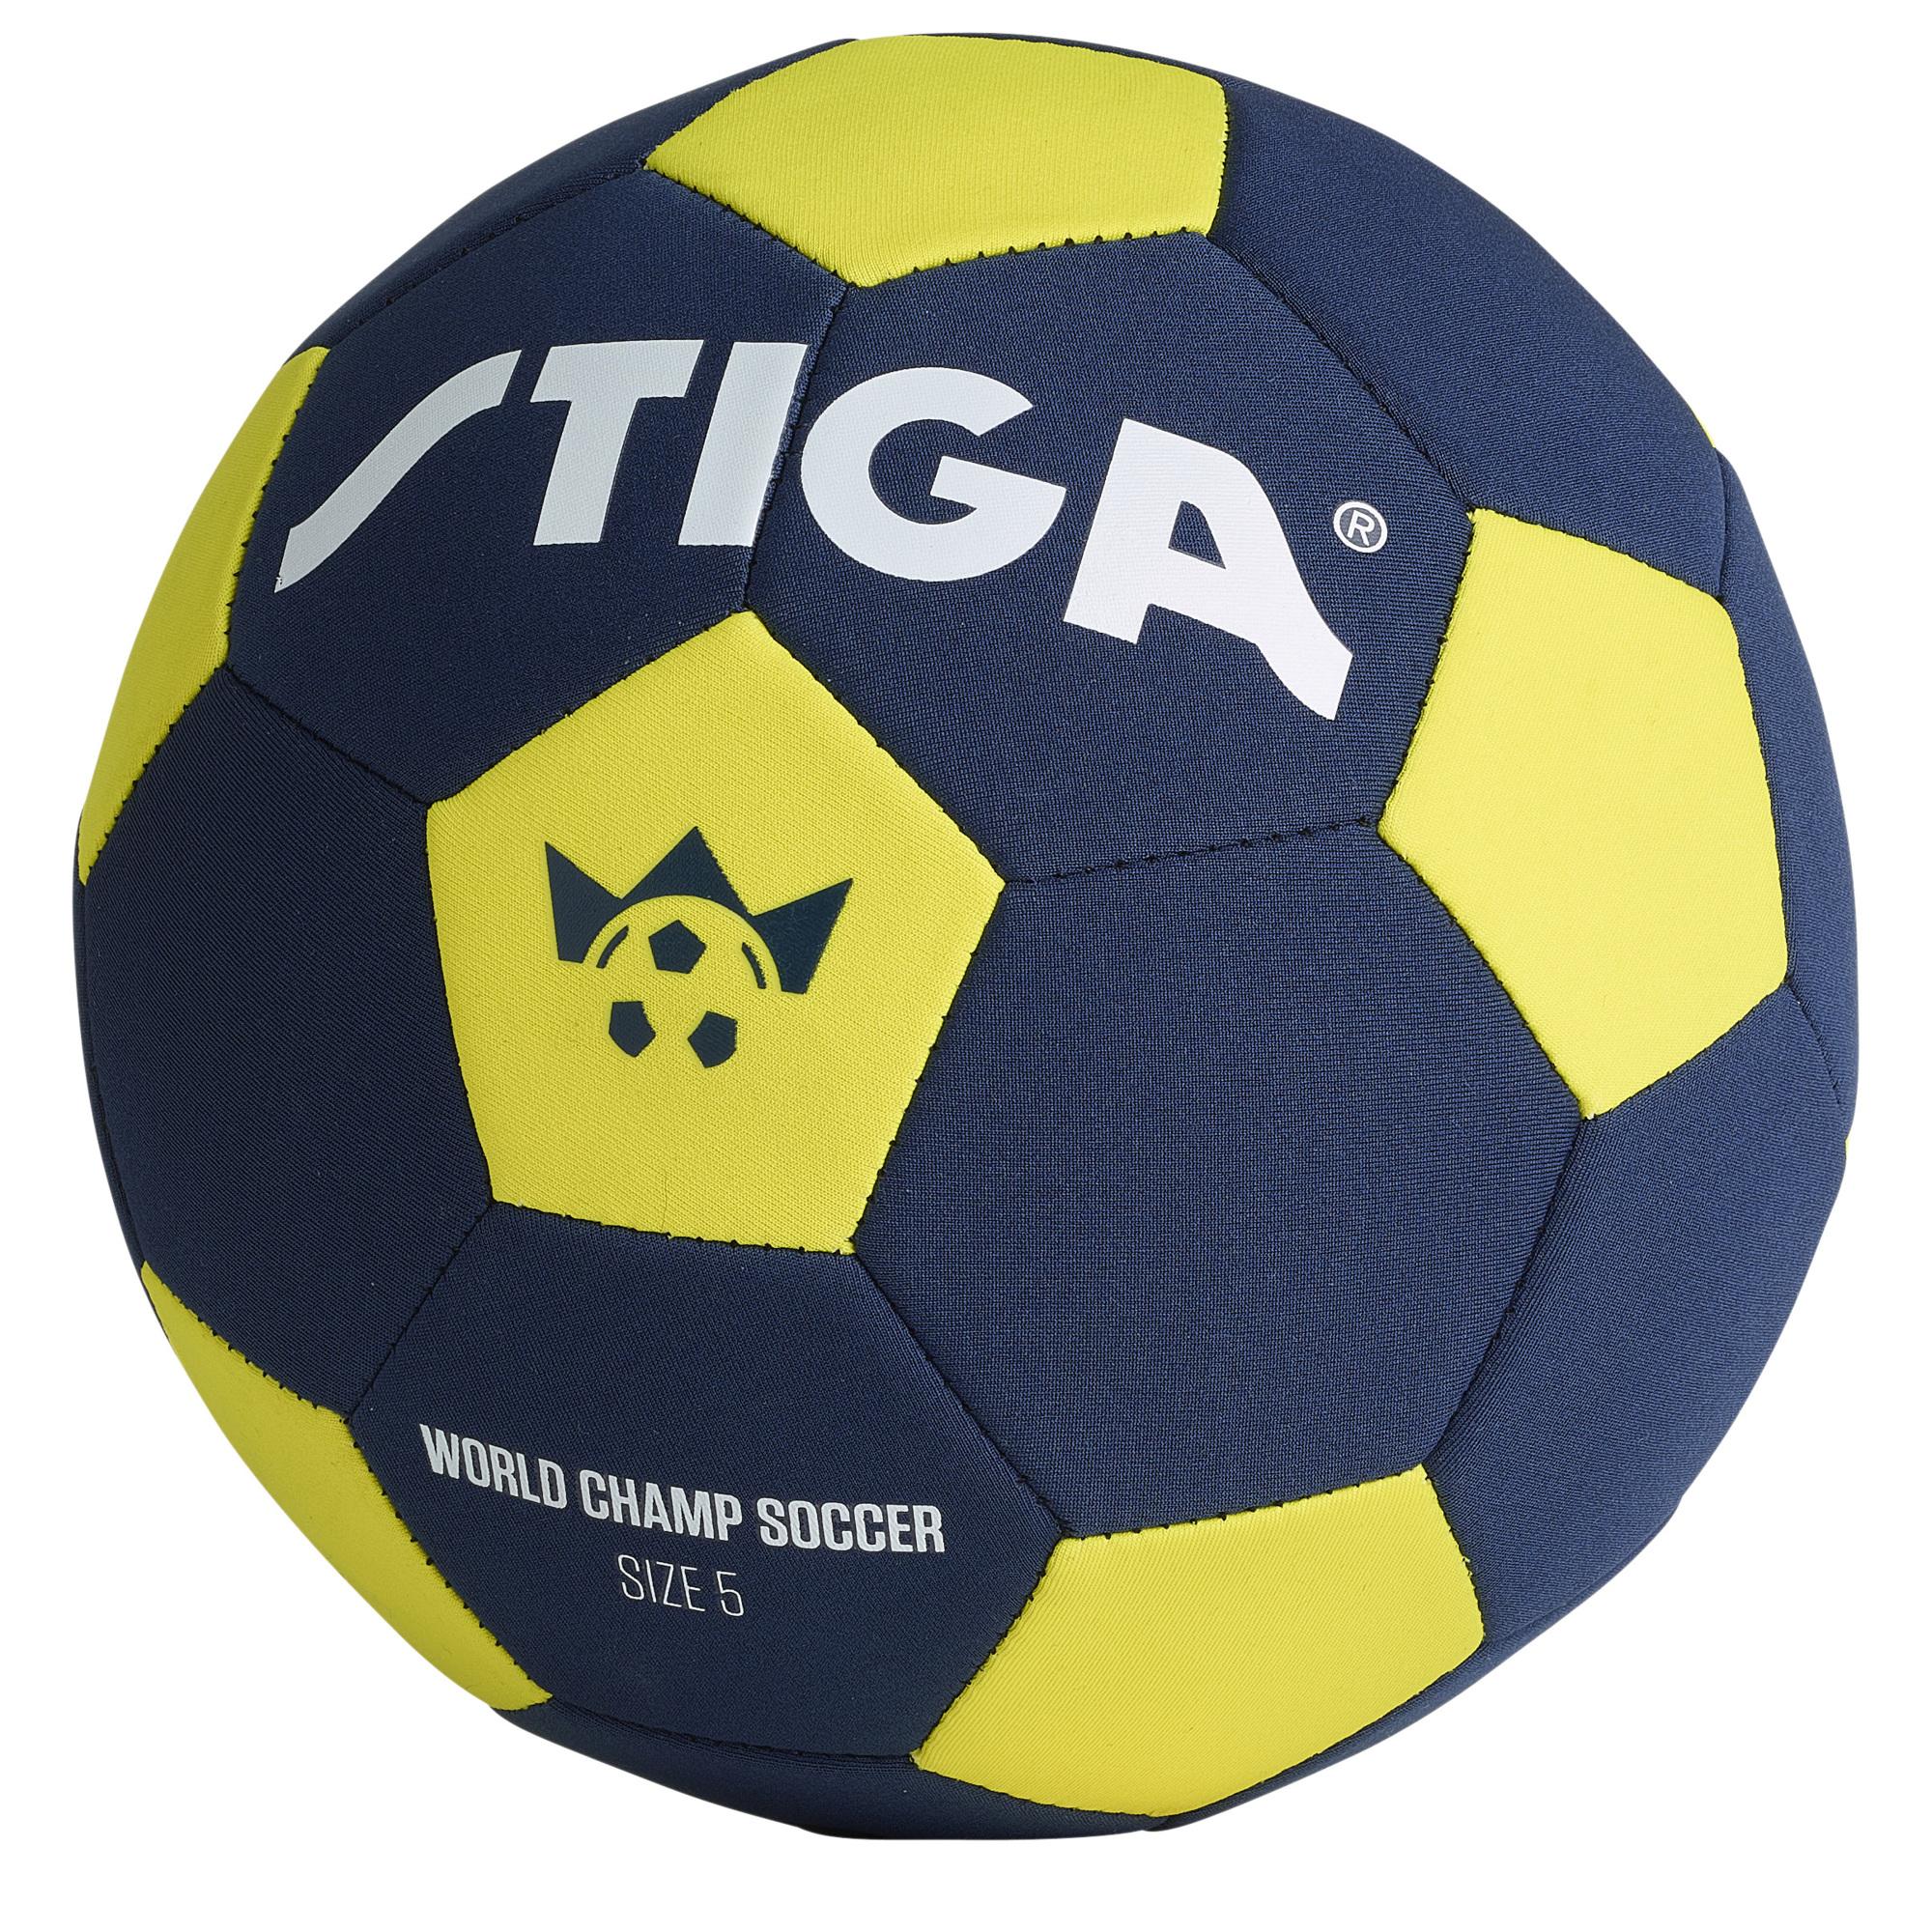 Stiga - Neo Soccer Fodbold (str. 5)